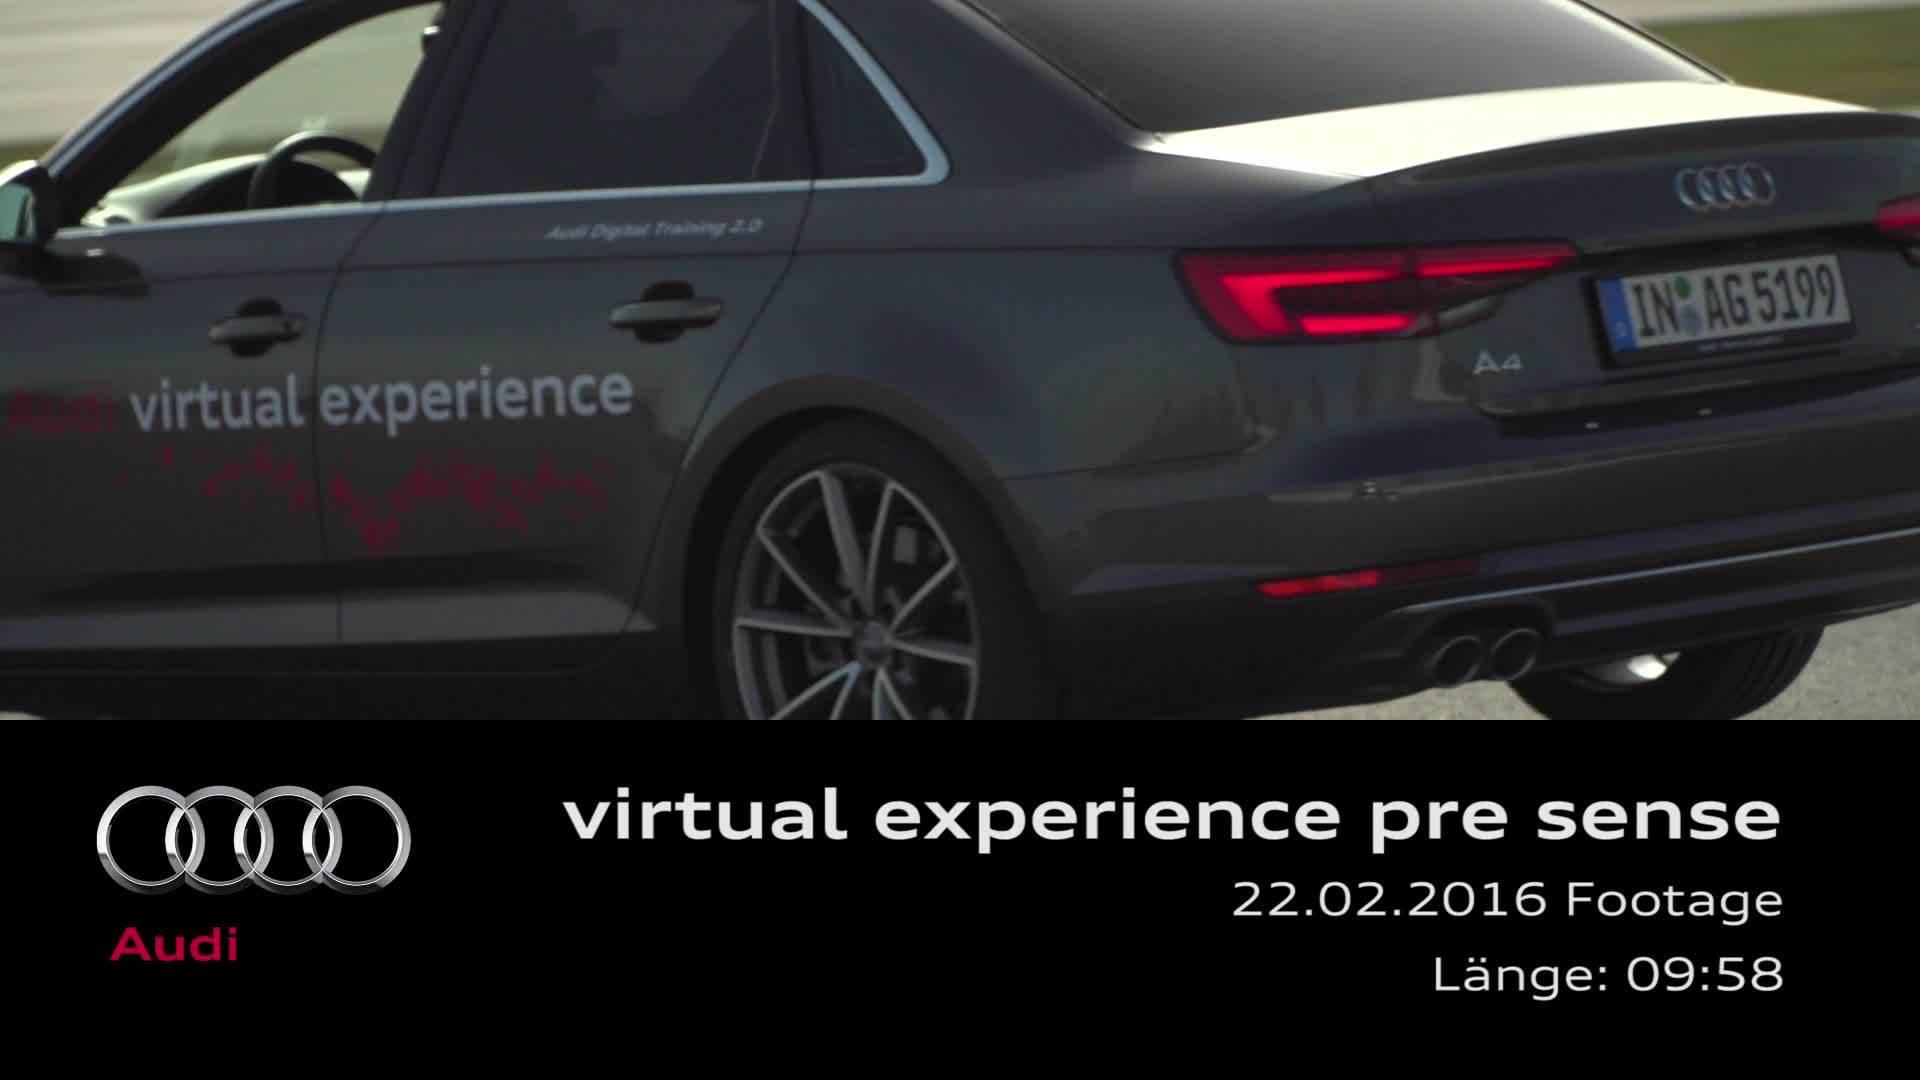 Virtual Experience pre sense - Footage